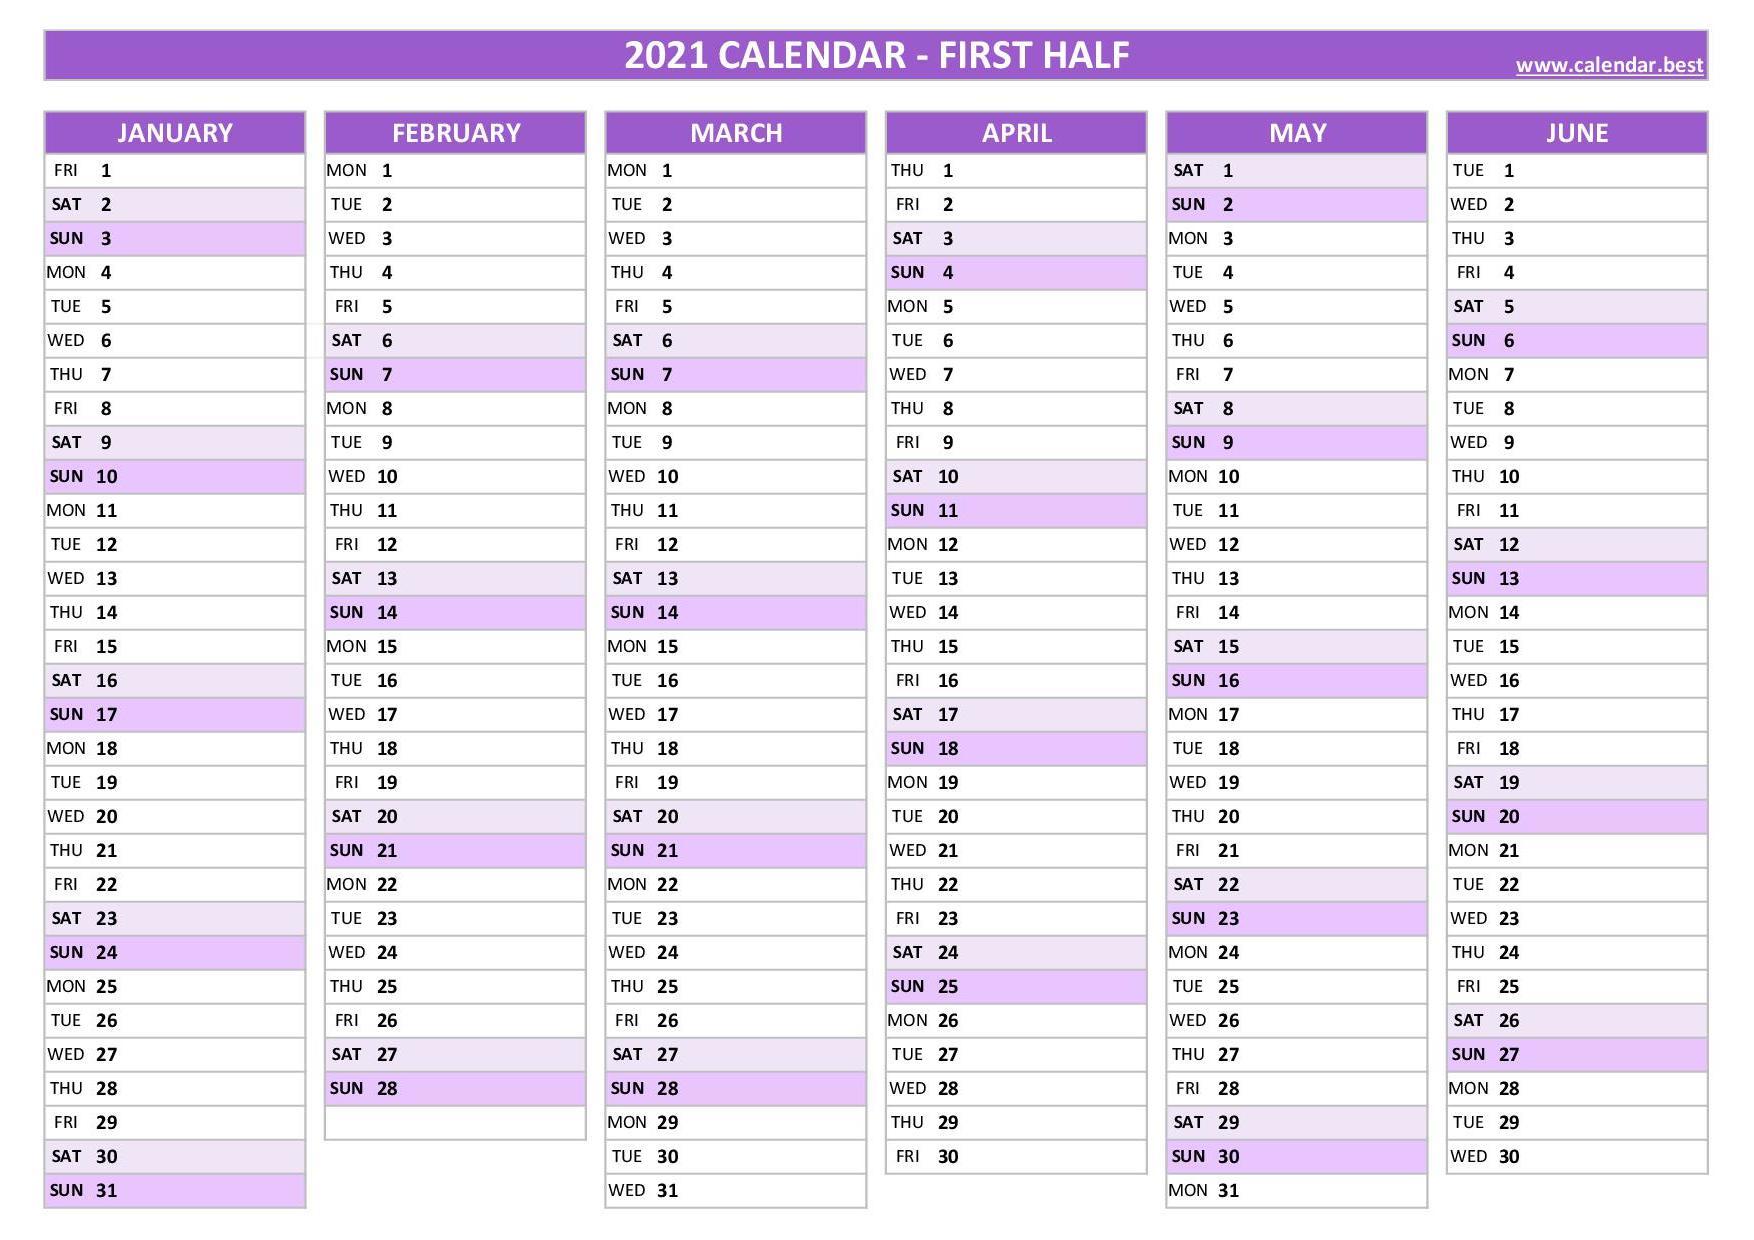 2021 half year calendar -Calendar.best